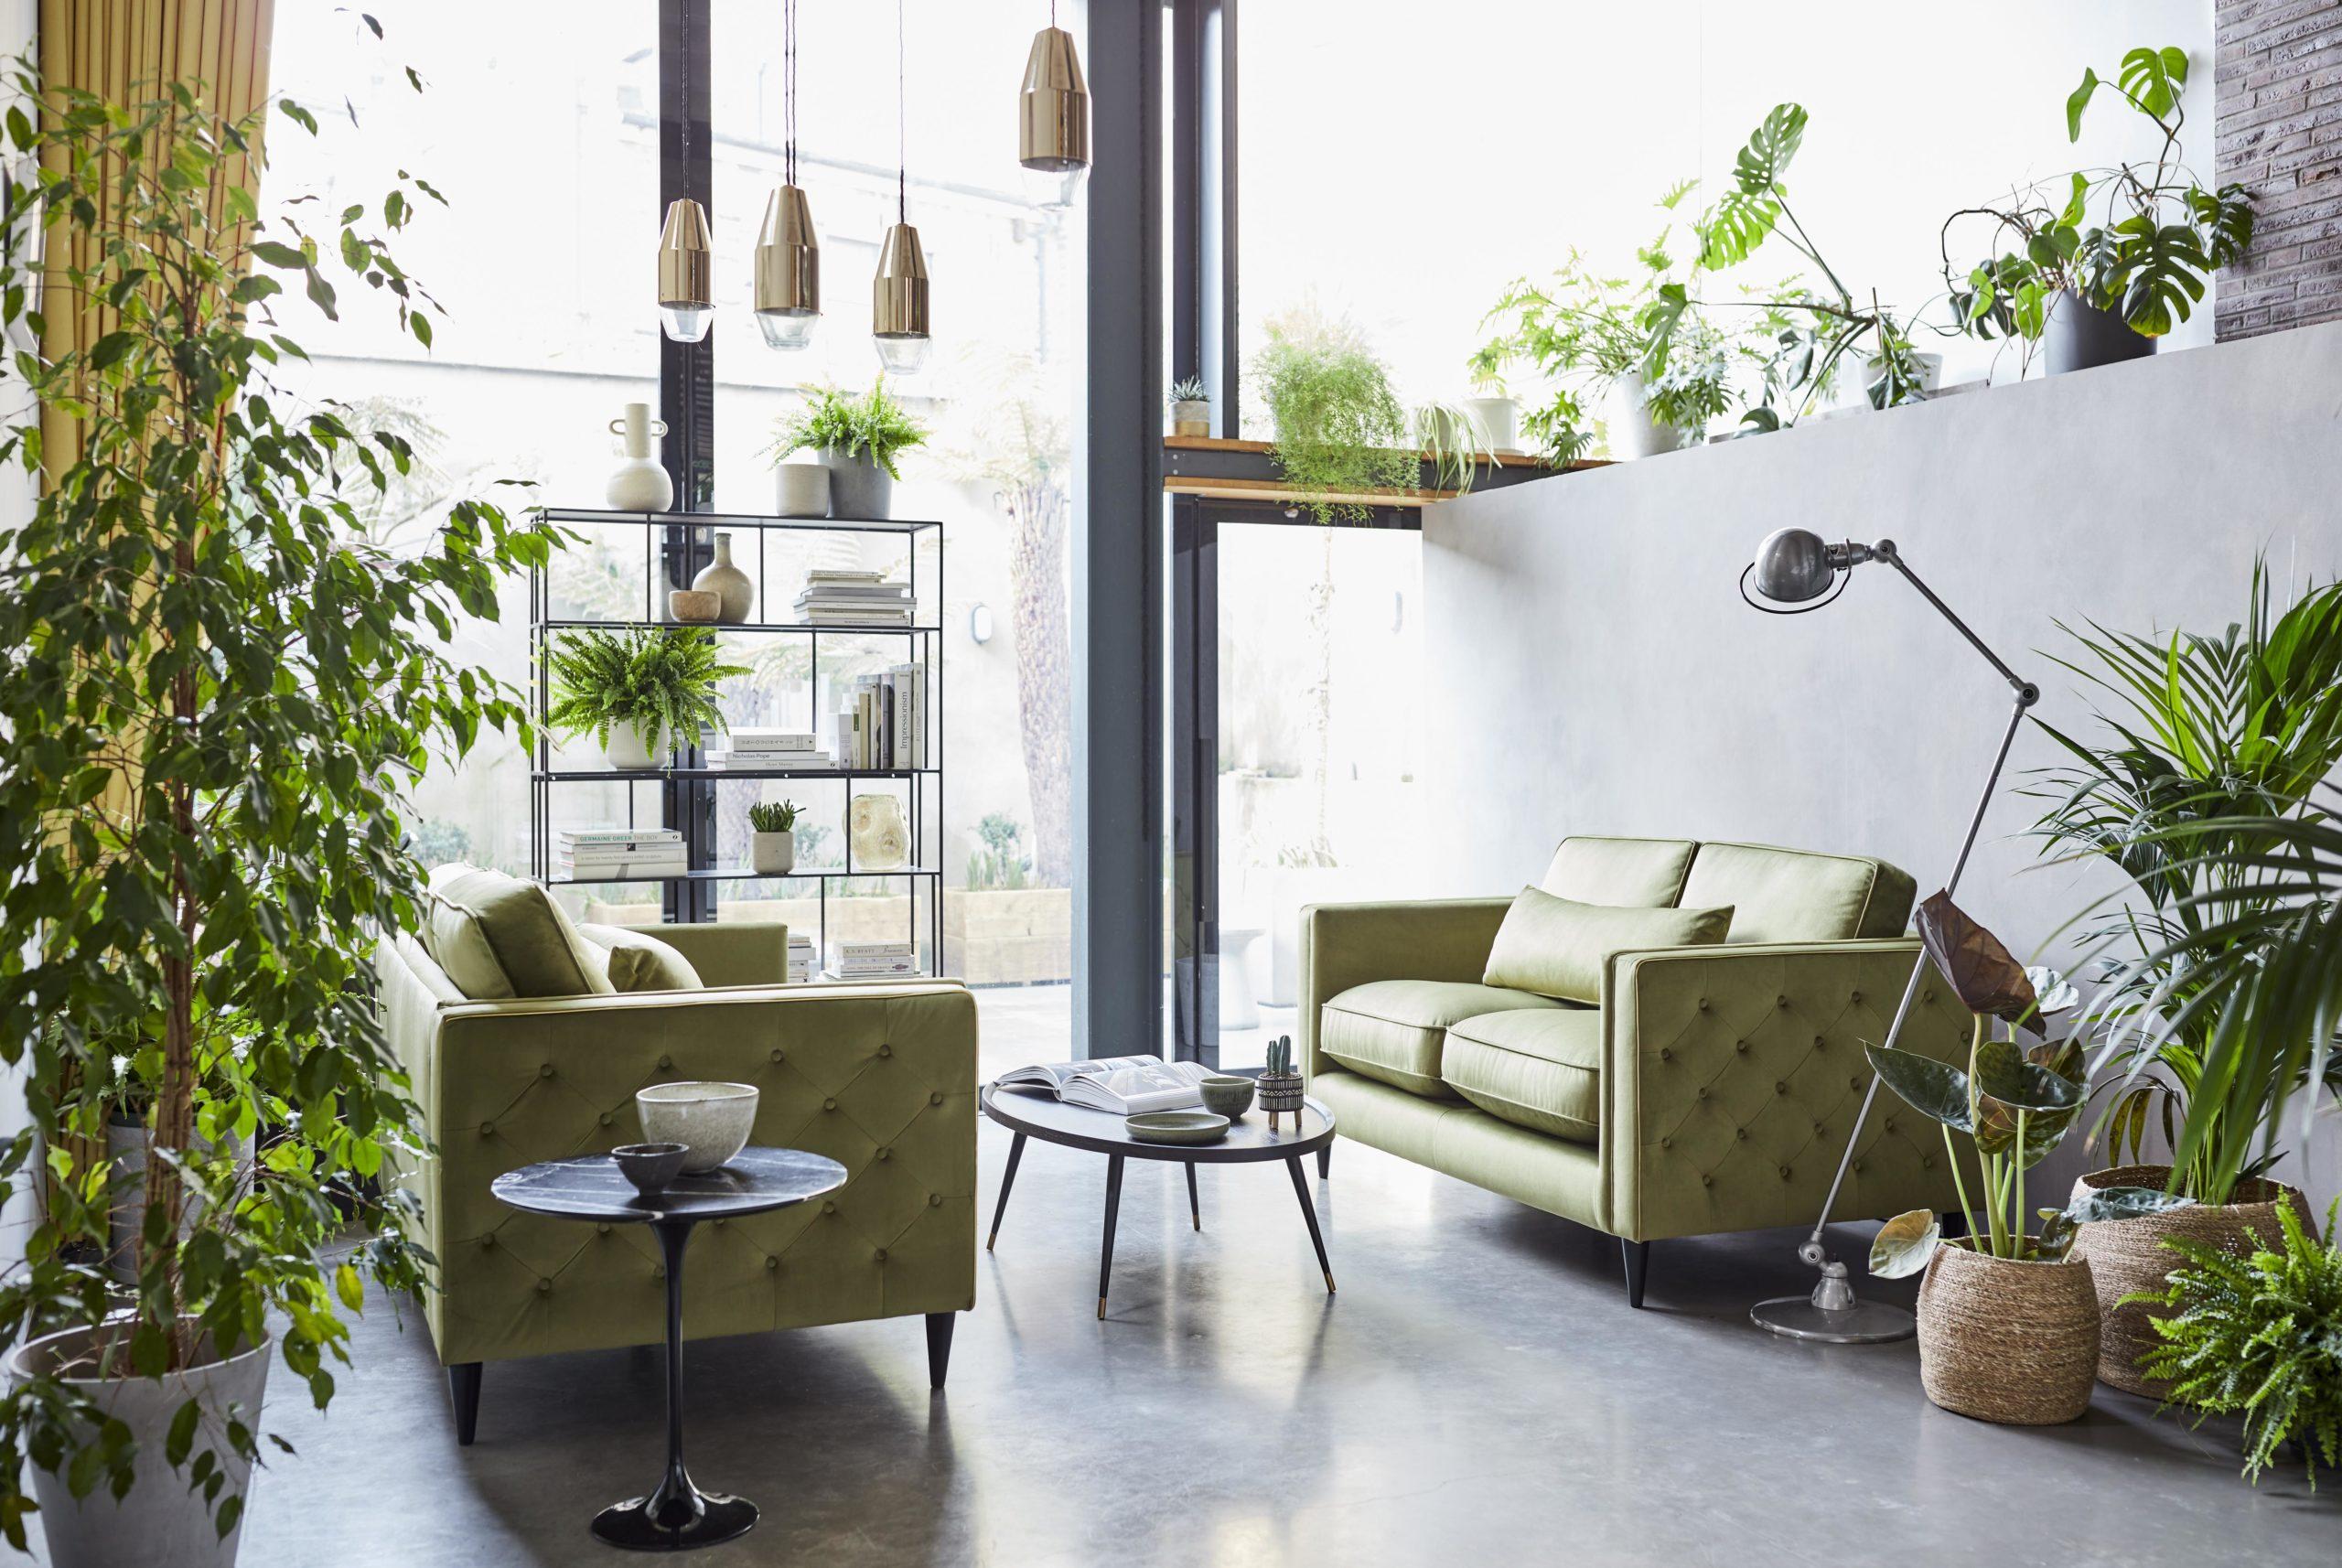 HOME EDIT: Go Green